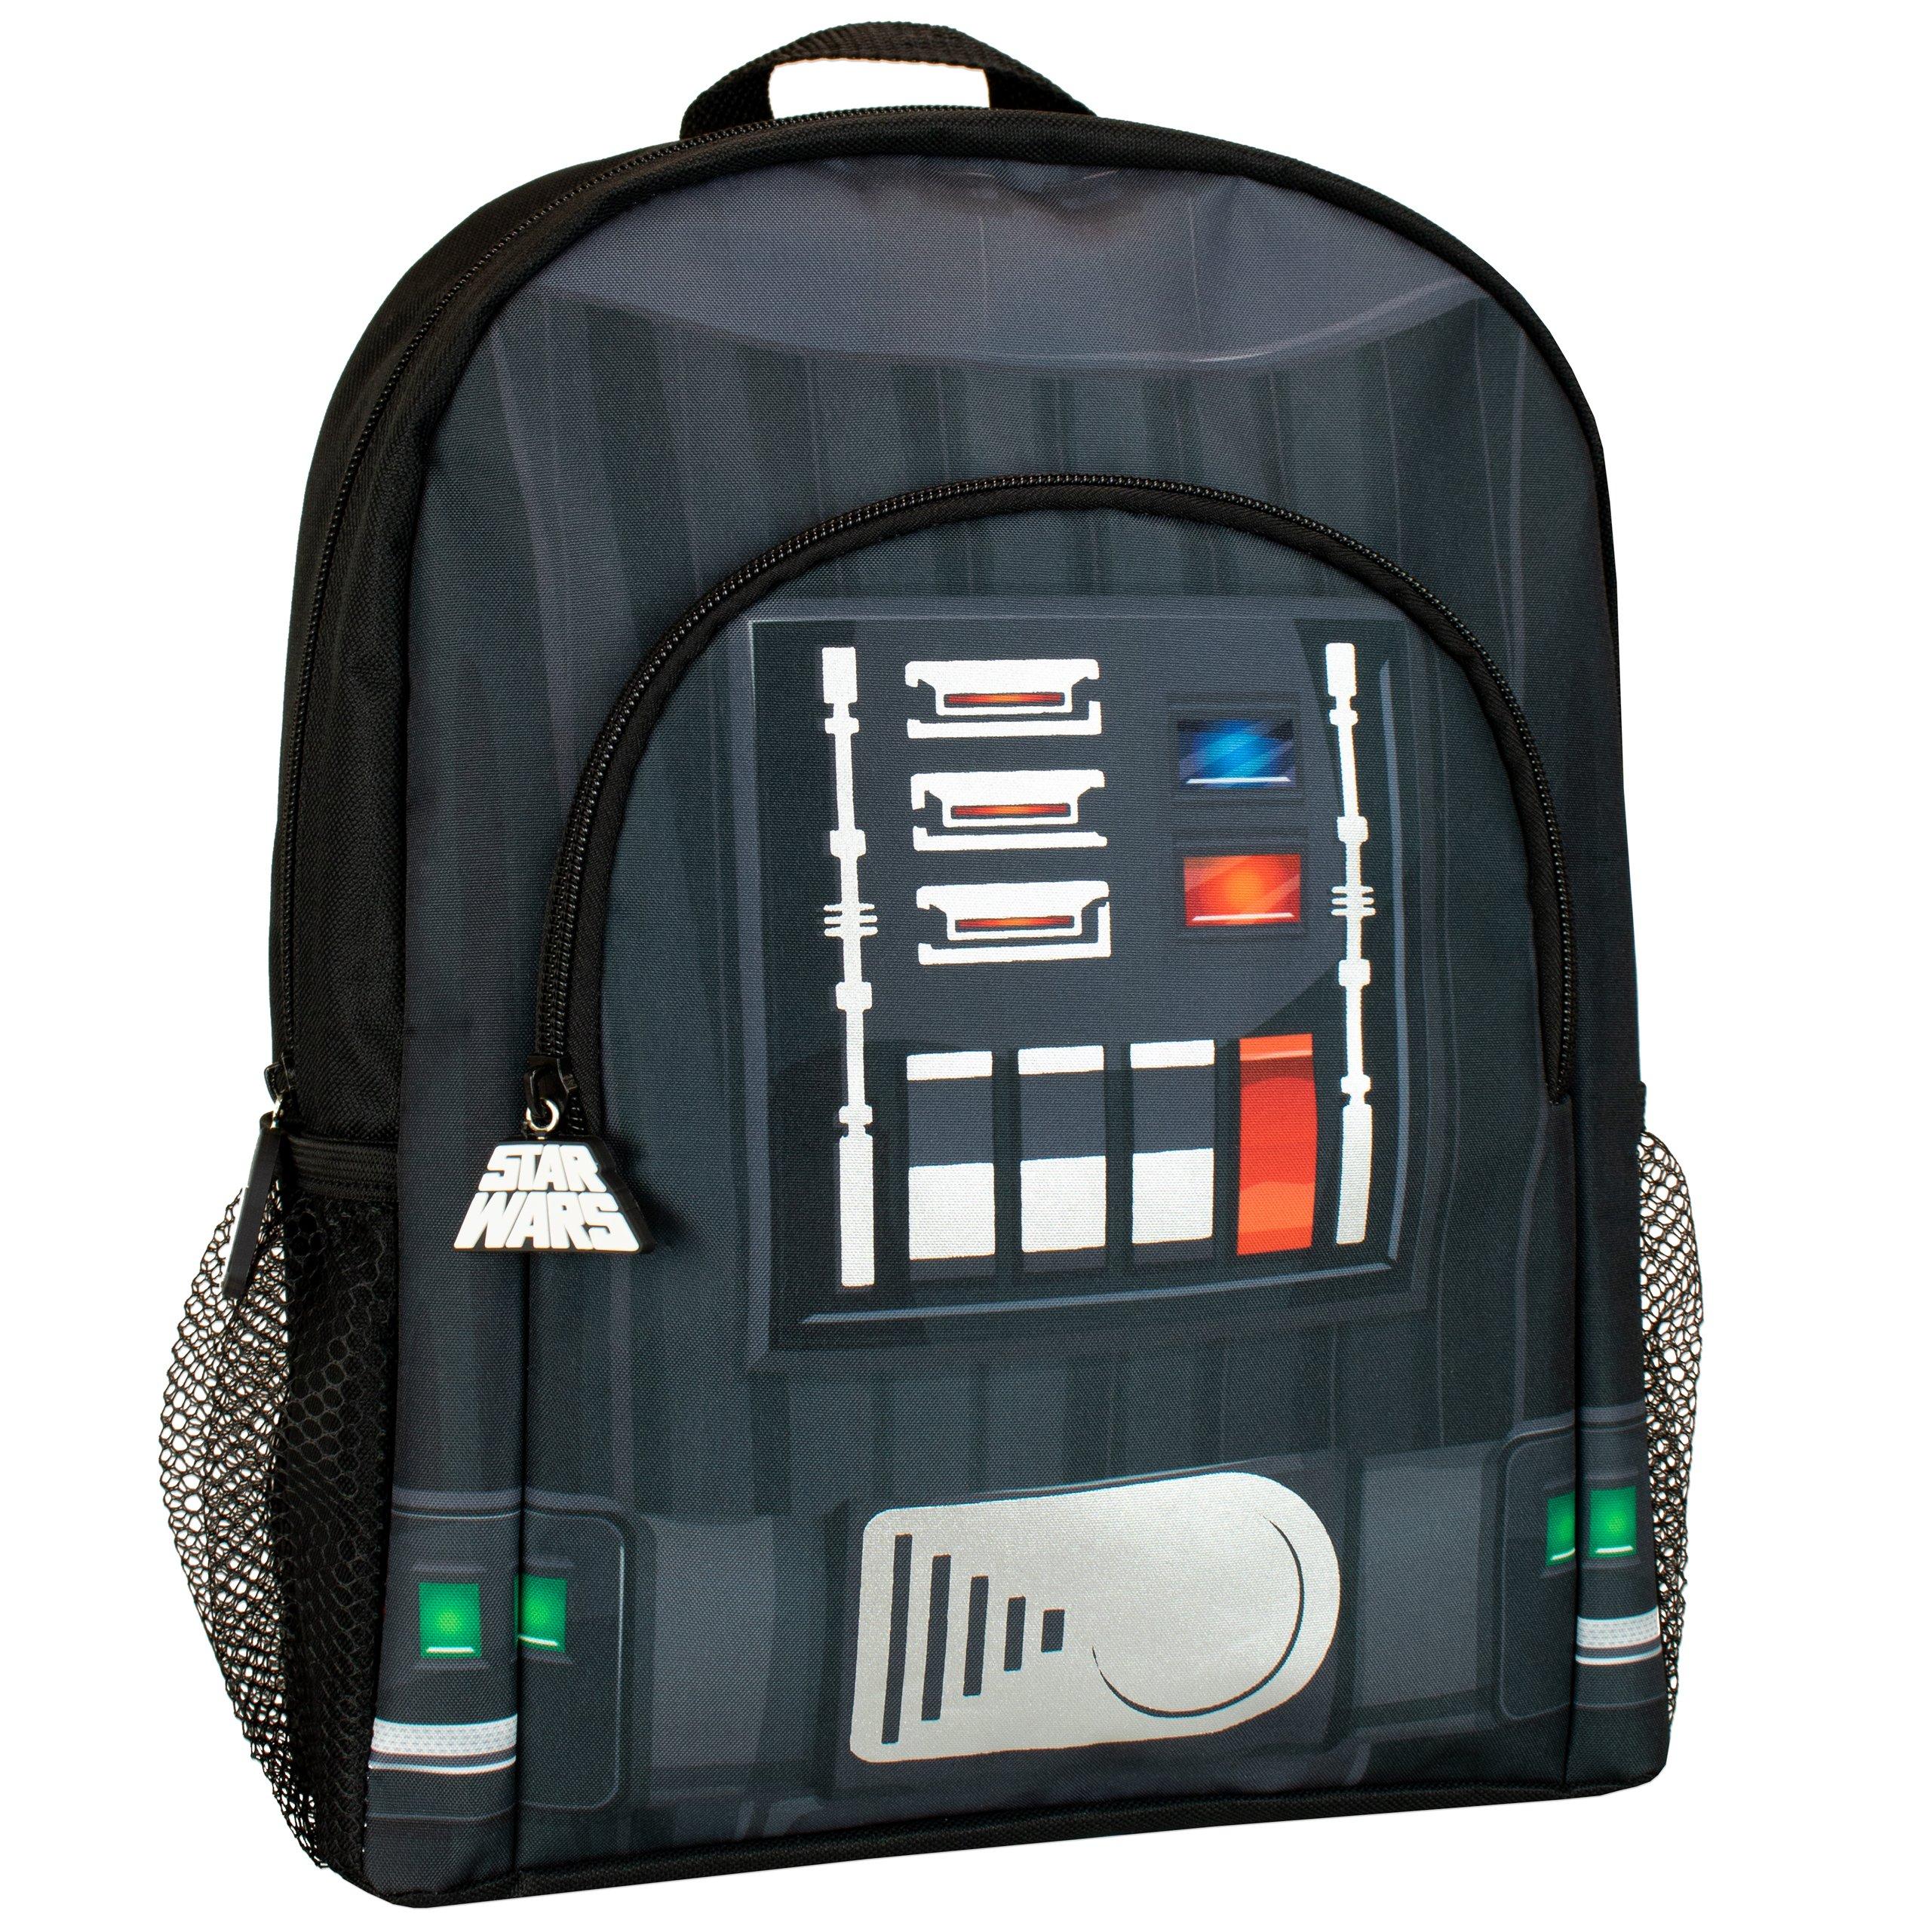 Kids Star Wars Backpack - Darth Vader £5.95 delivered, with code @ Character